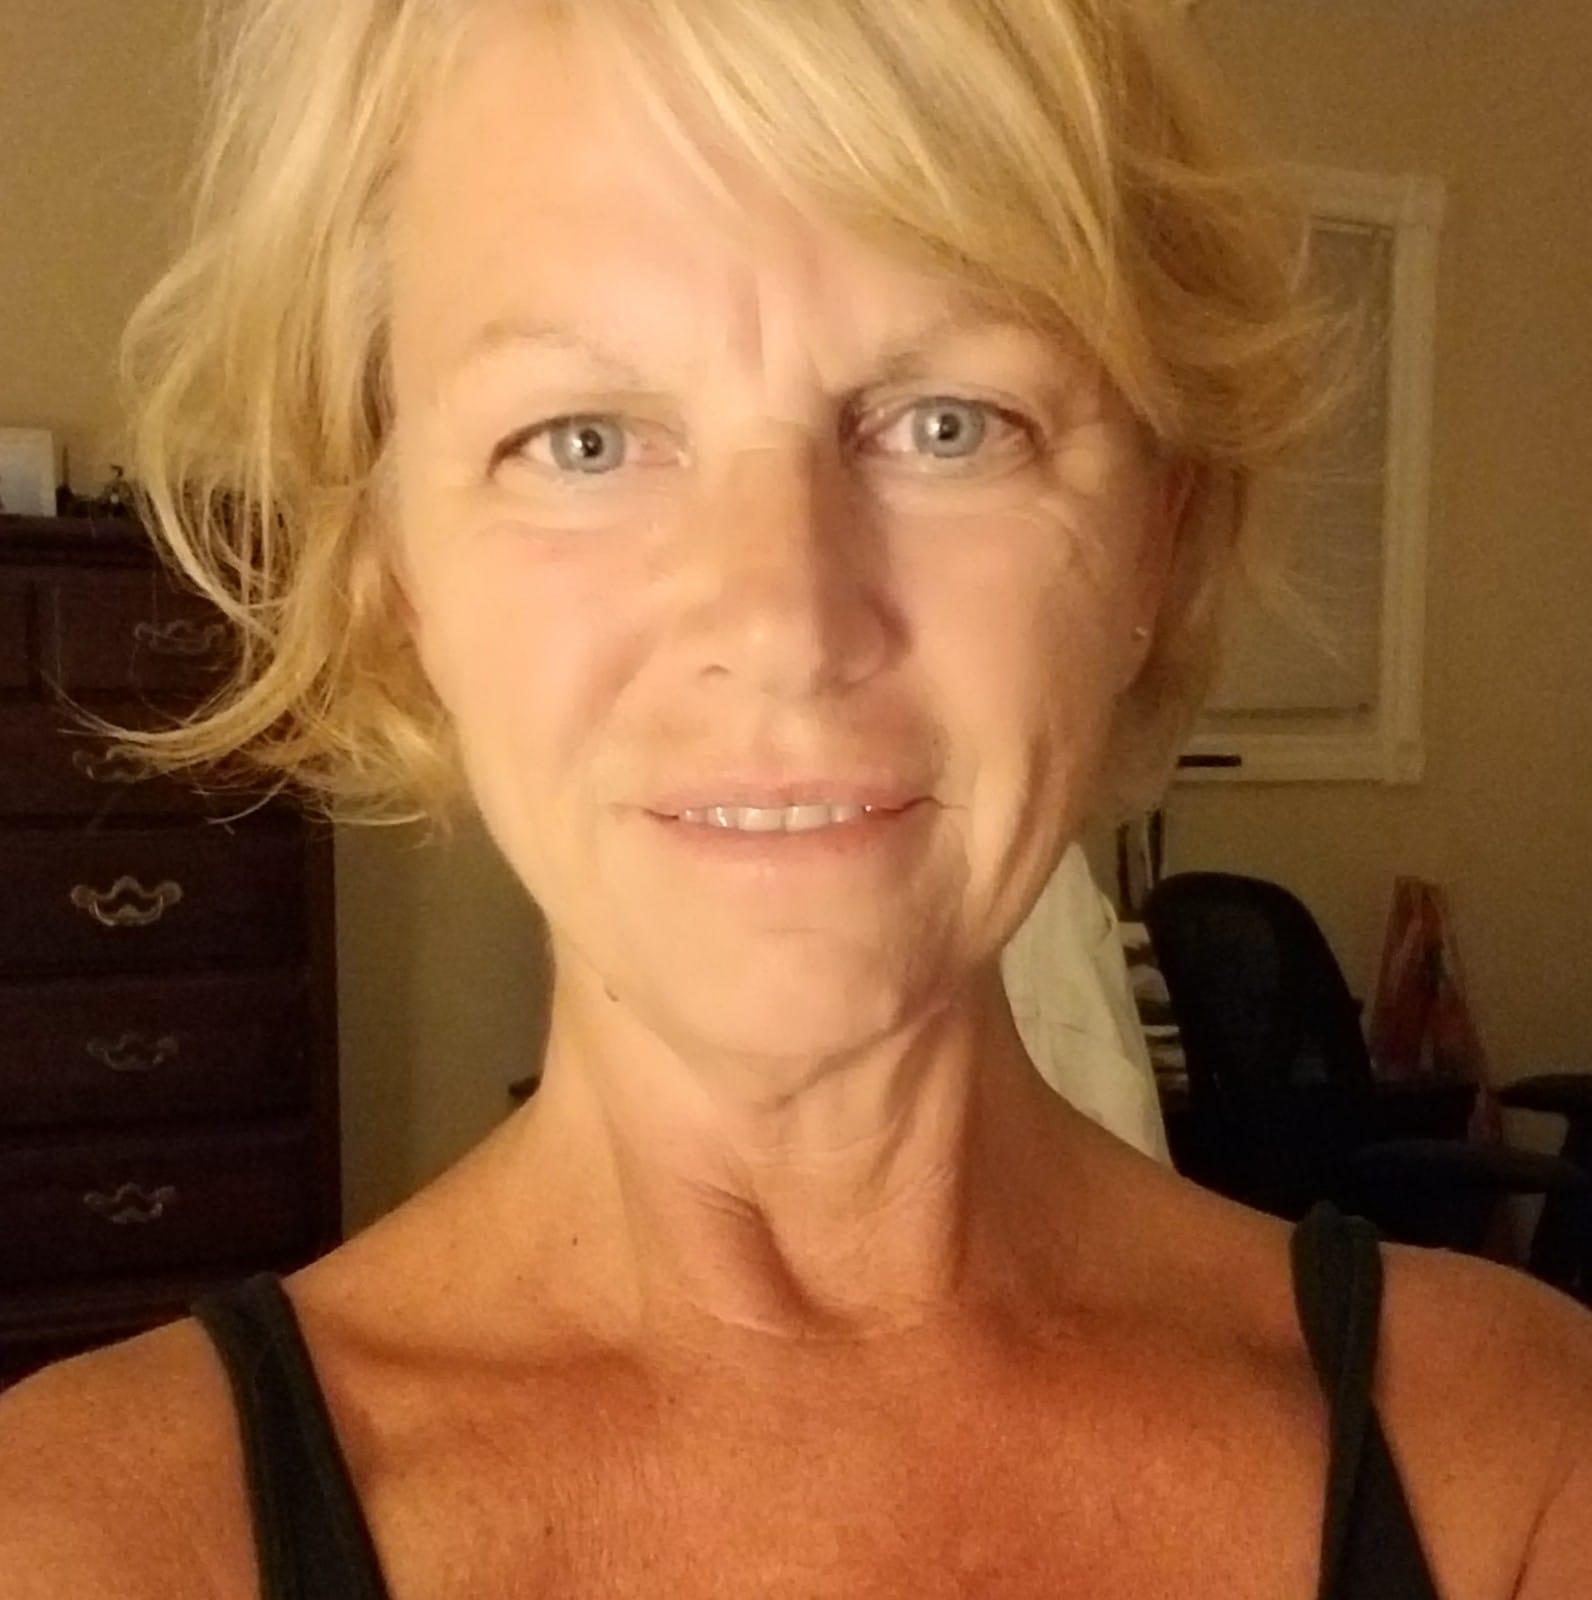 6 people arrested in strangulation death of former Michigan teacher